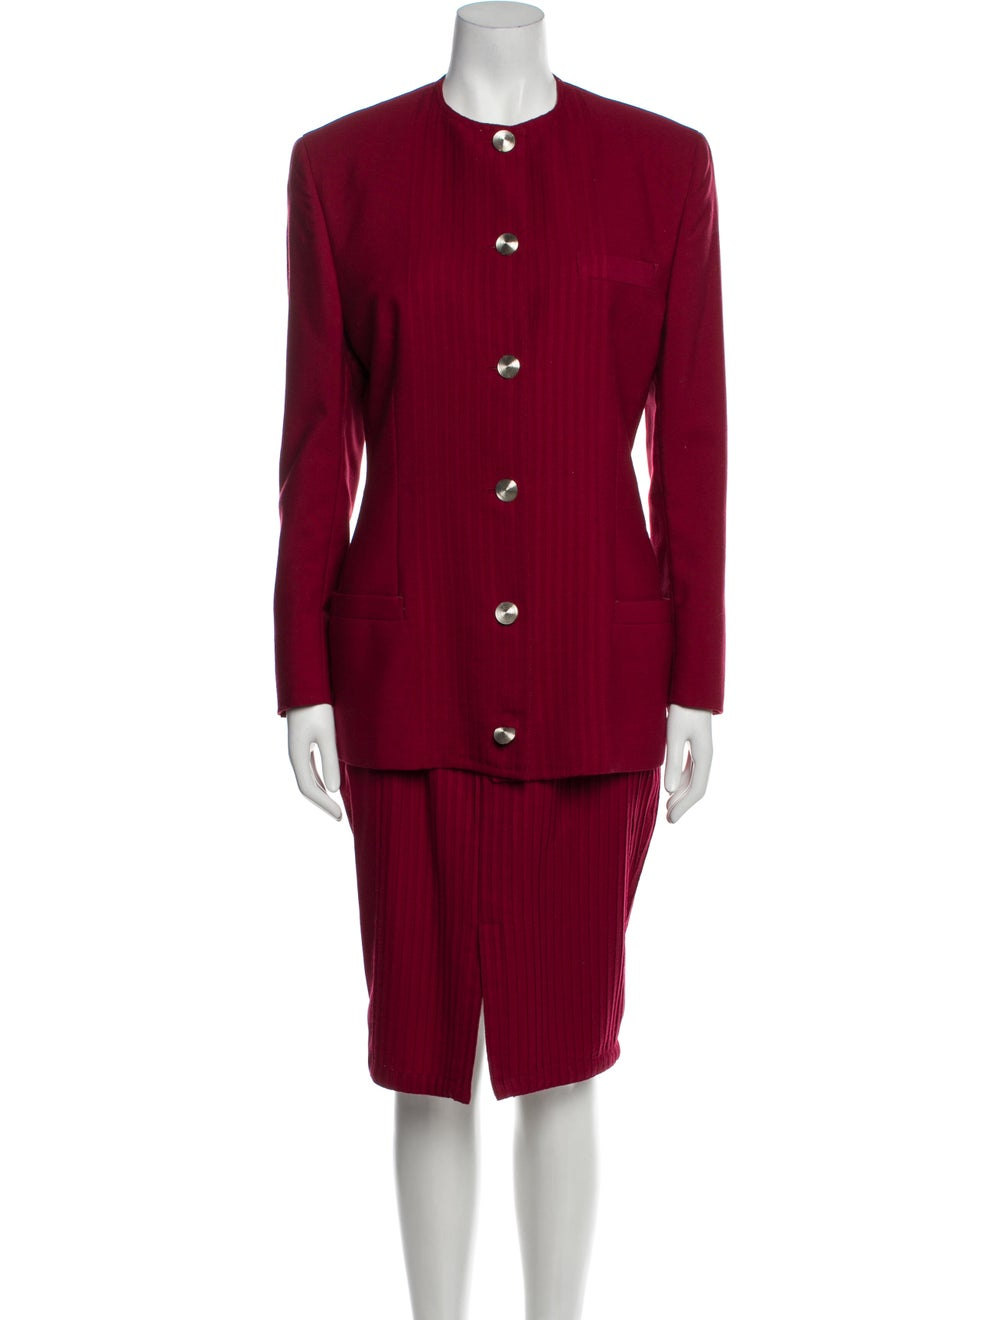 Gianni Versace Vintage 1990 Skirt Suit Wool - image 1